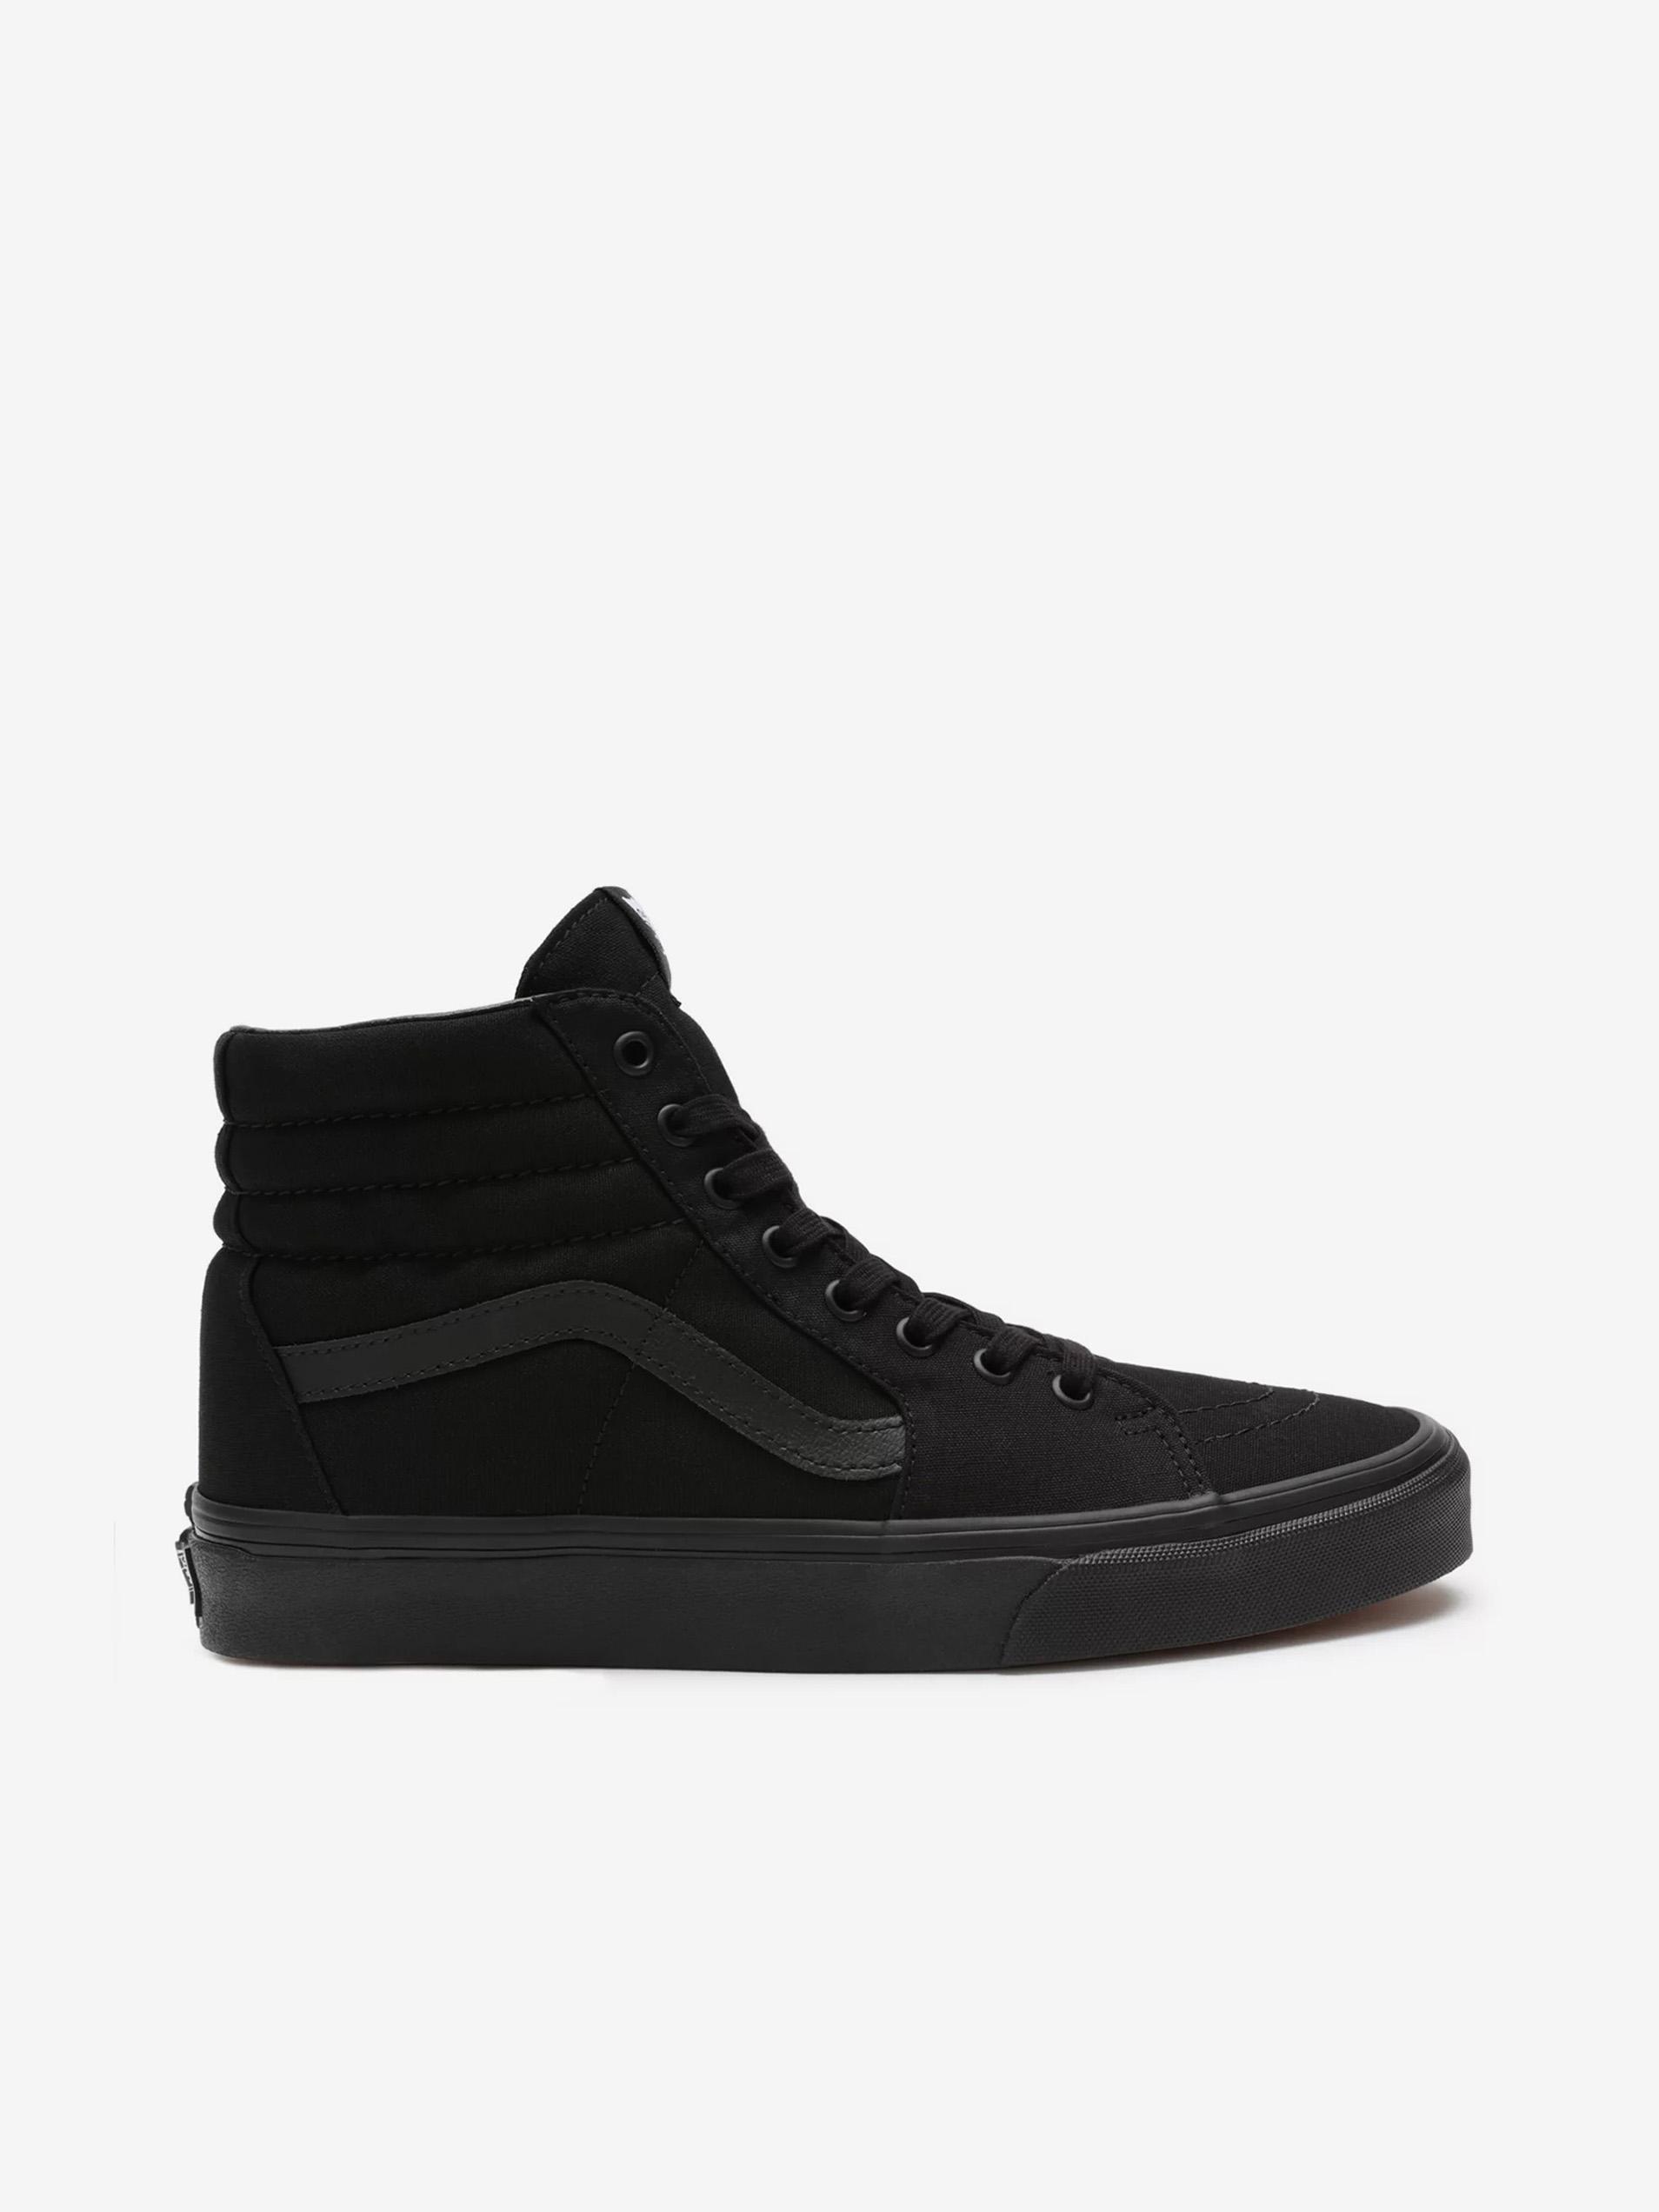 Čierne pánske členkové topánky VANS SK8-Hi - 42 1/2